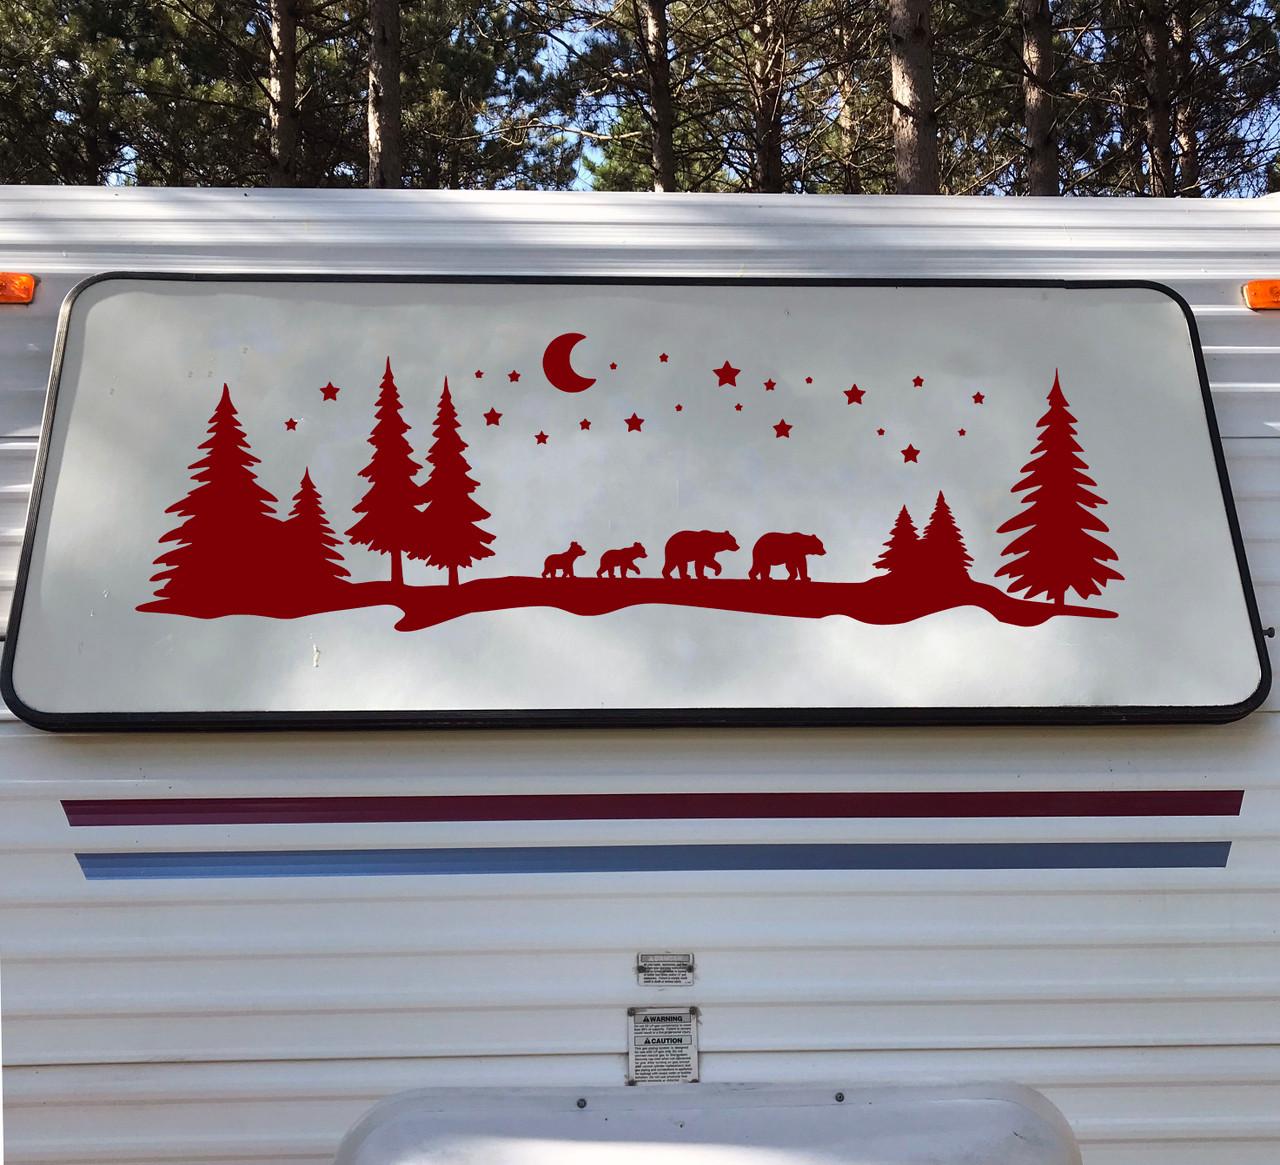 Bear Family Moon Stars Trees Scene Vinyl Decal - Forest Camper Graphics - Die Cut Sticker